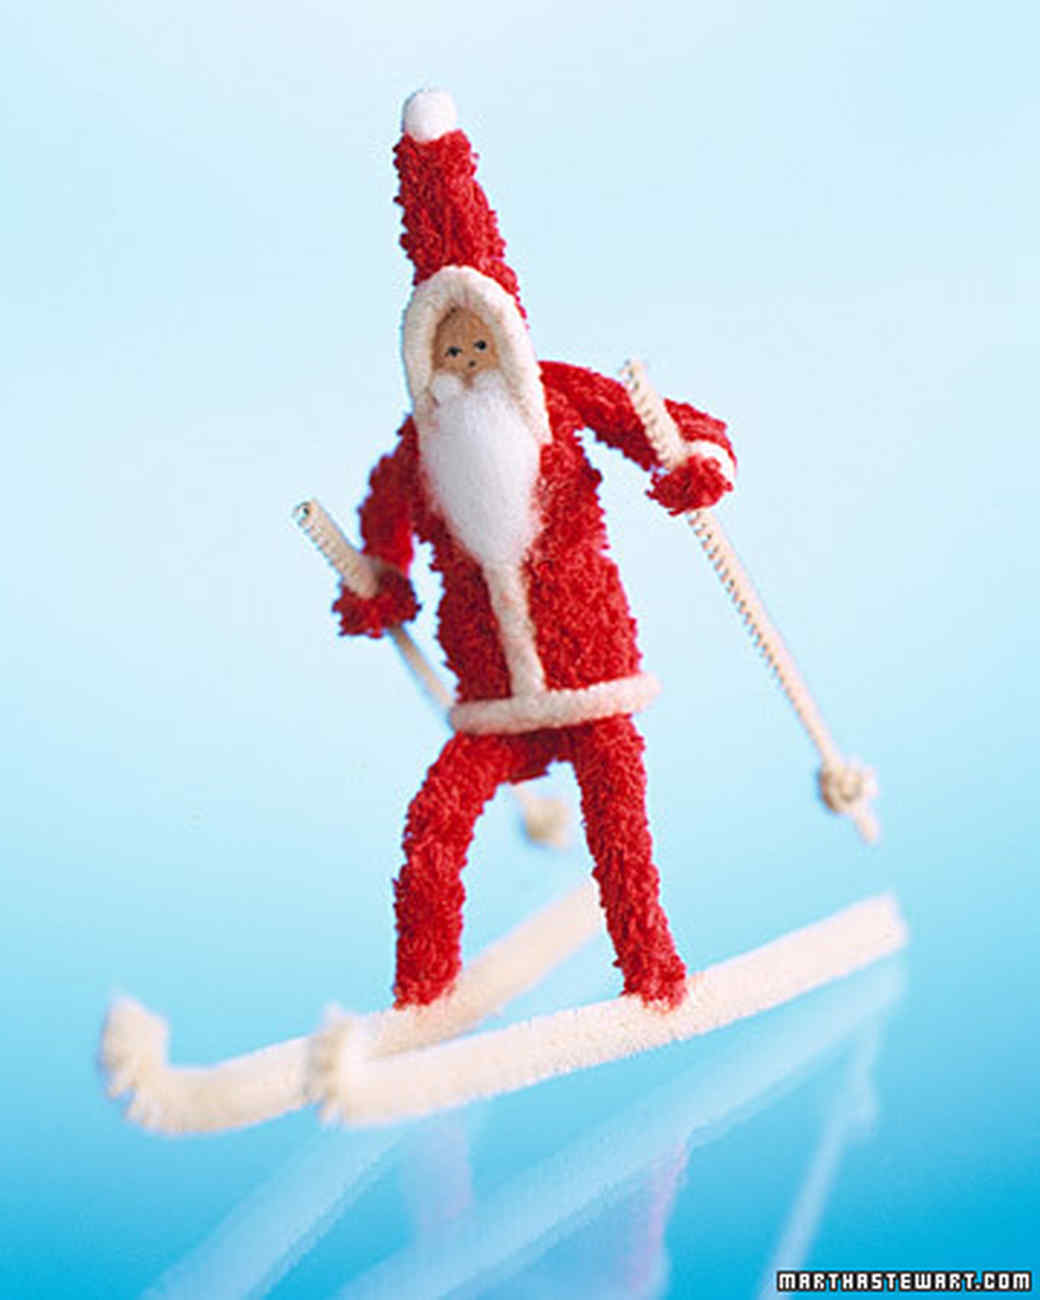 Pipe Cleaner Santa Claus